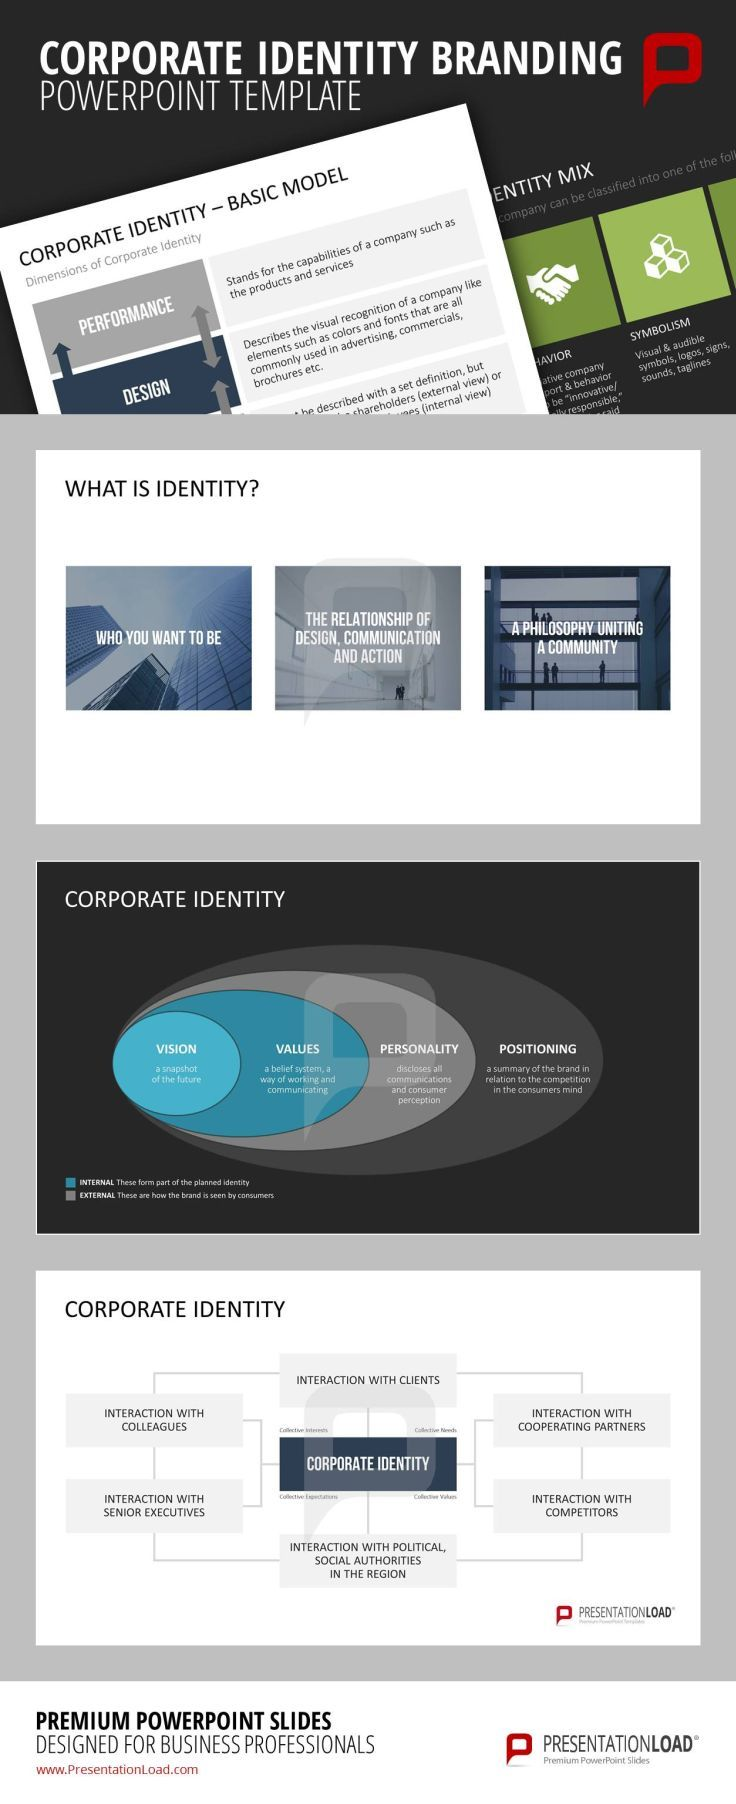 Define your Corporate Identity. Corporate identity